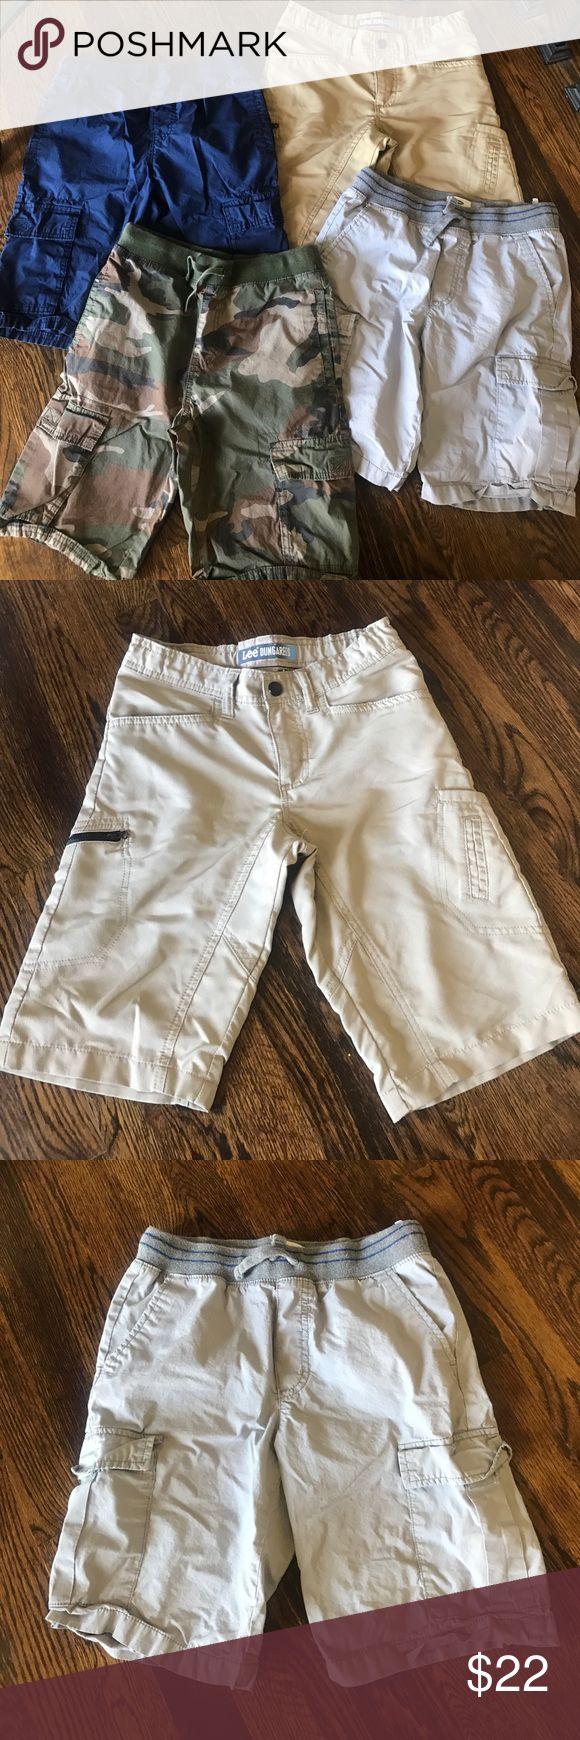 Lot of Boys Size 10-12 Shorts Navy Old Navy Cargo drawstring Shorts, size 10-12. Camouflage Old Navy drawstring shorts, size 10-12. Khaki Lee Dungaree snap close shorts, size 10 regular. Grey Old Navy drawstring shorts, size 10-12. Bottoms Shorts